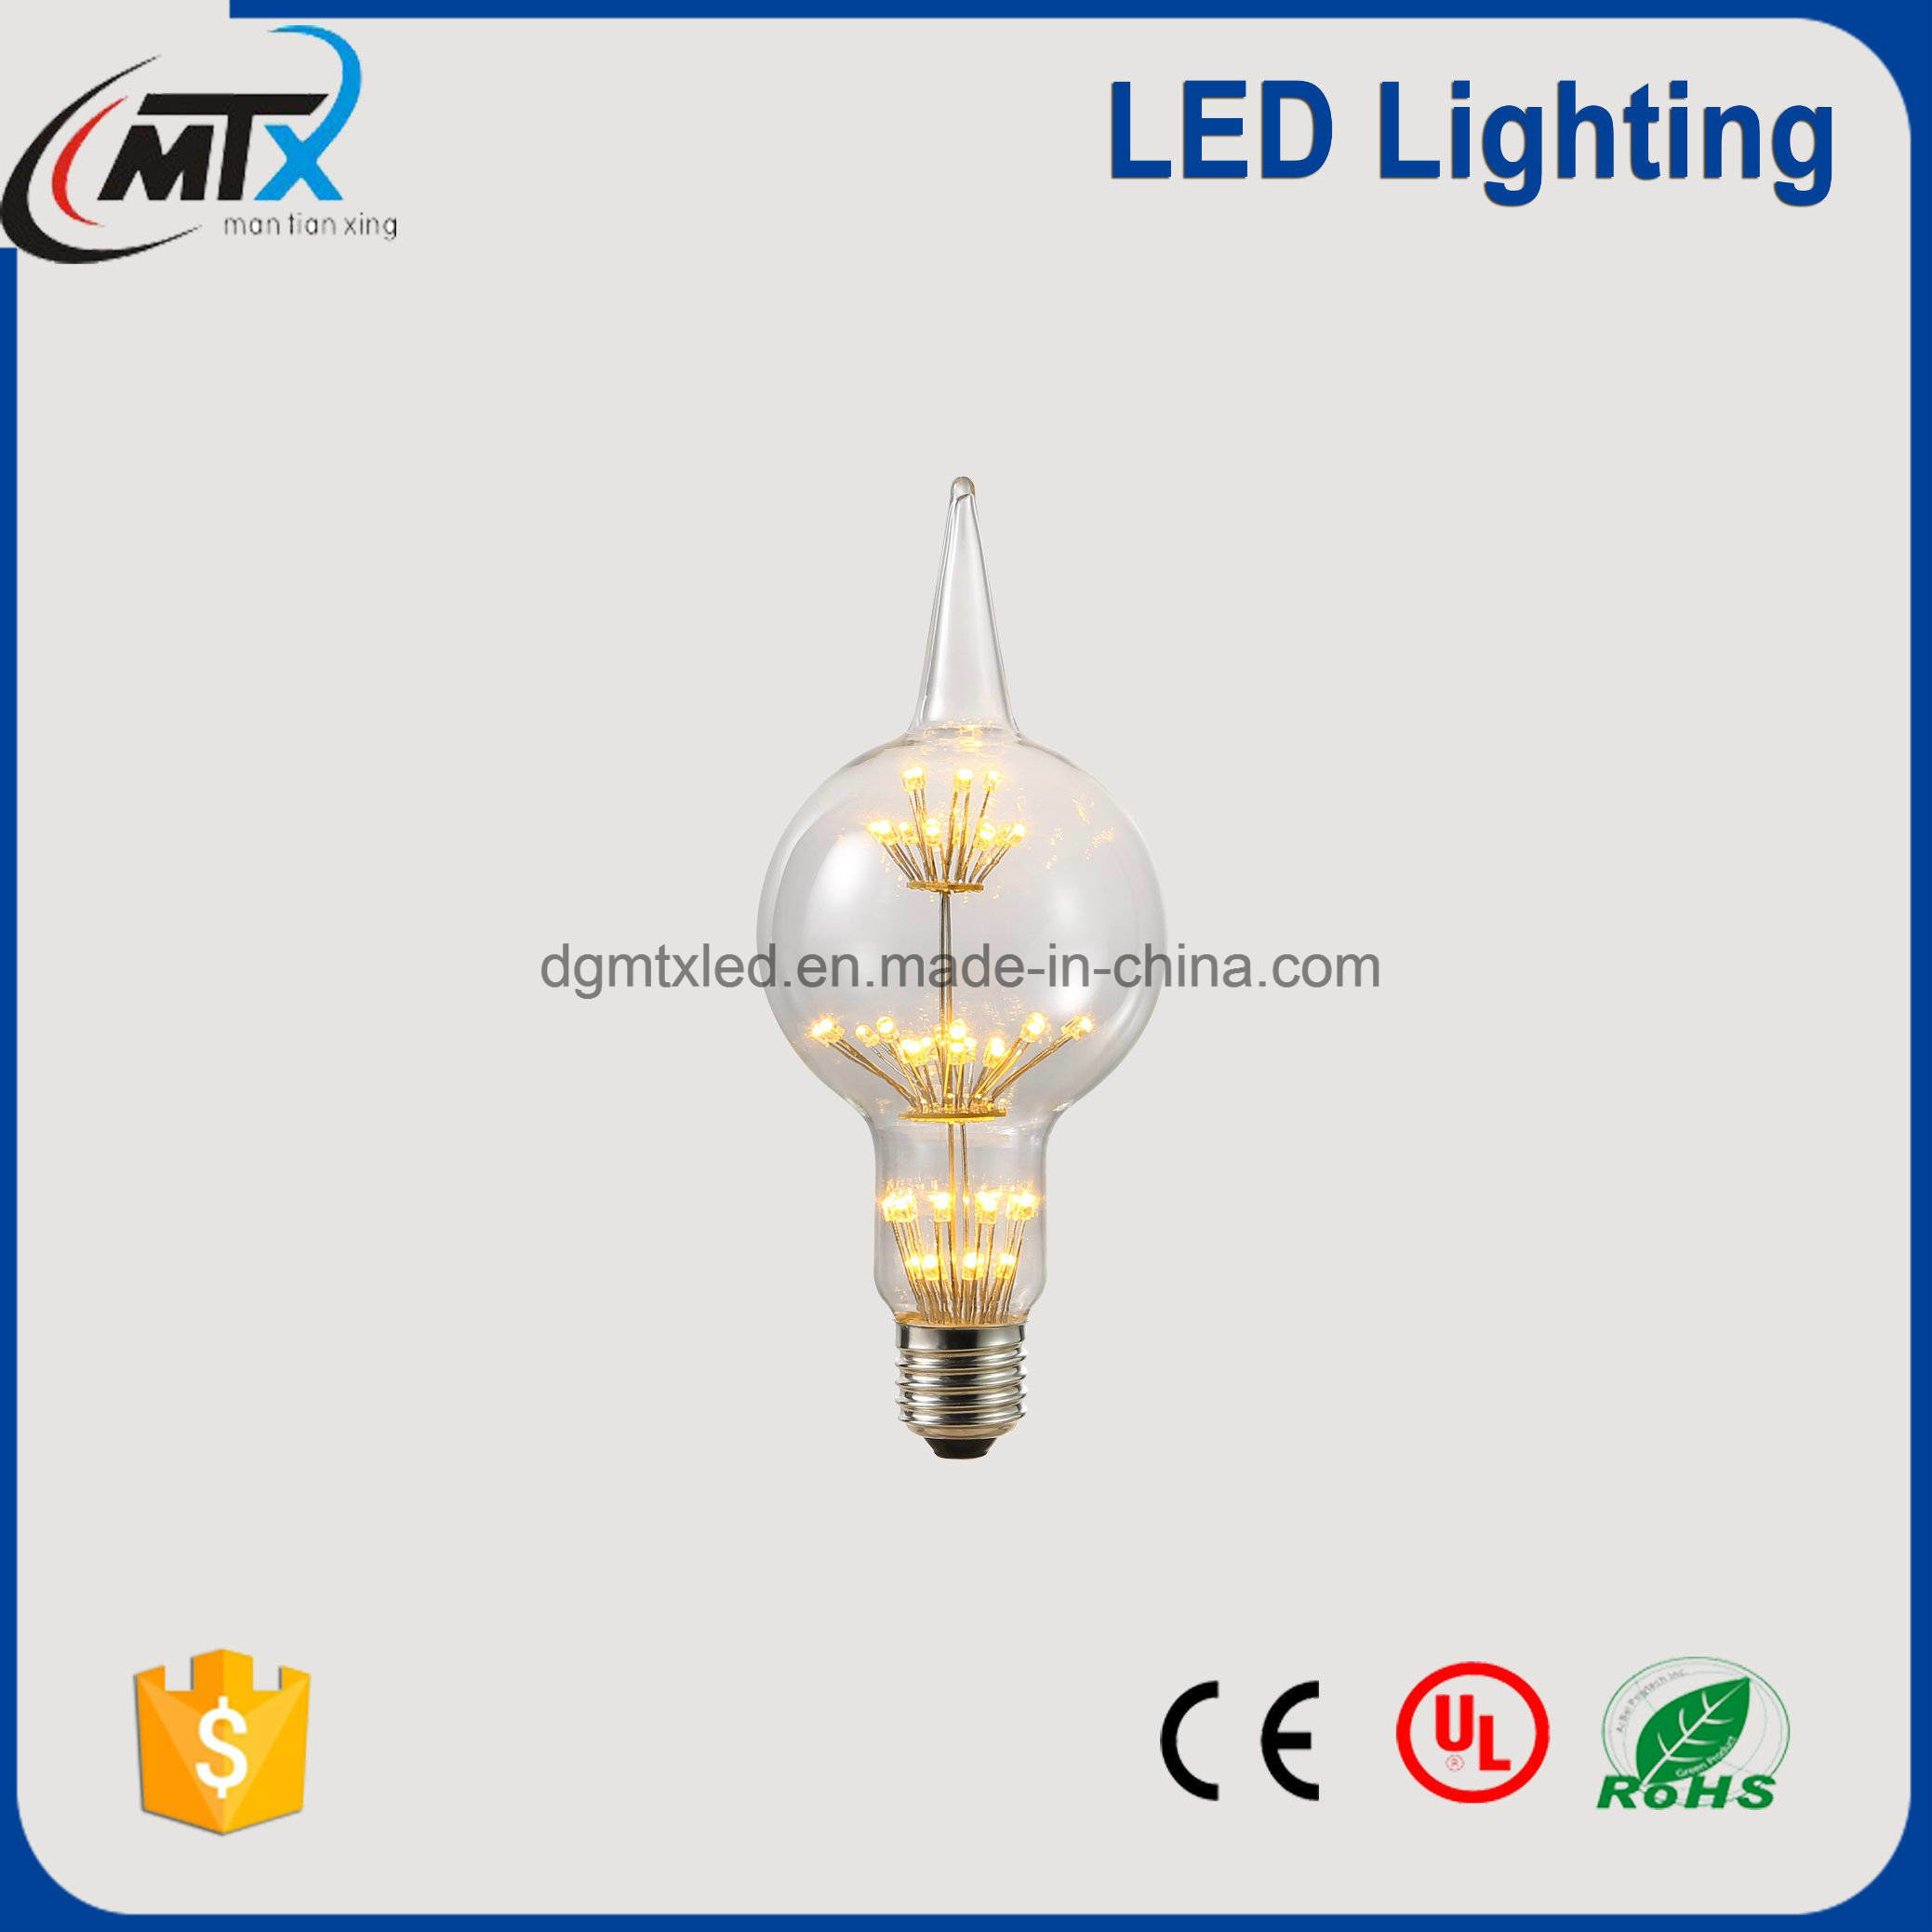 LED rechargeable emergency light bulb 2700K, LED diode 3W bulb